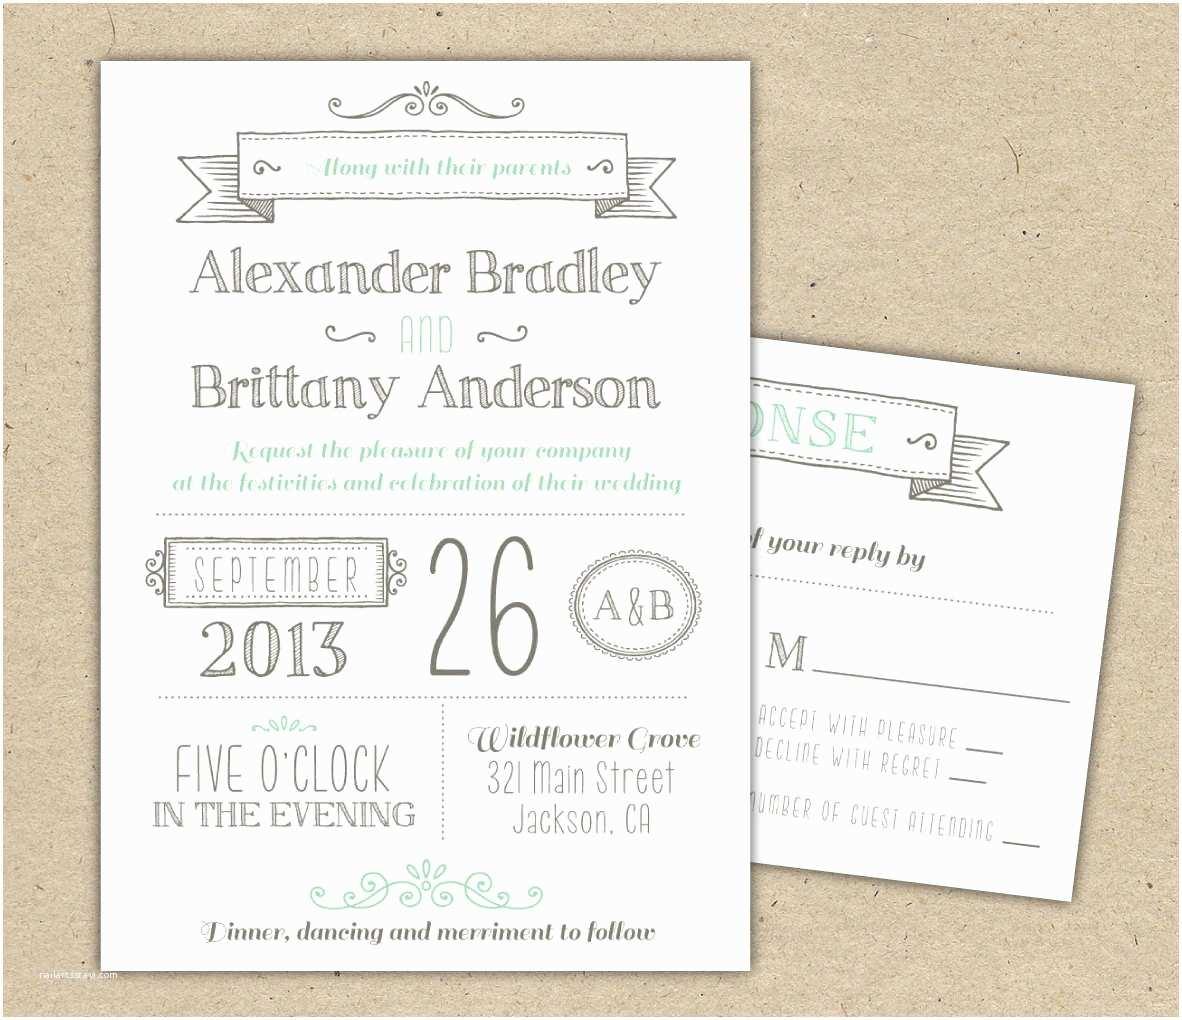 Free Wedding Invitation Templates top Pilation Free Printable Wedding Invitation